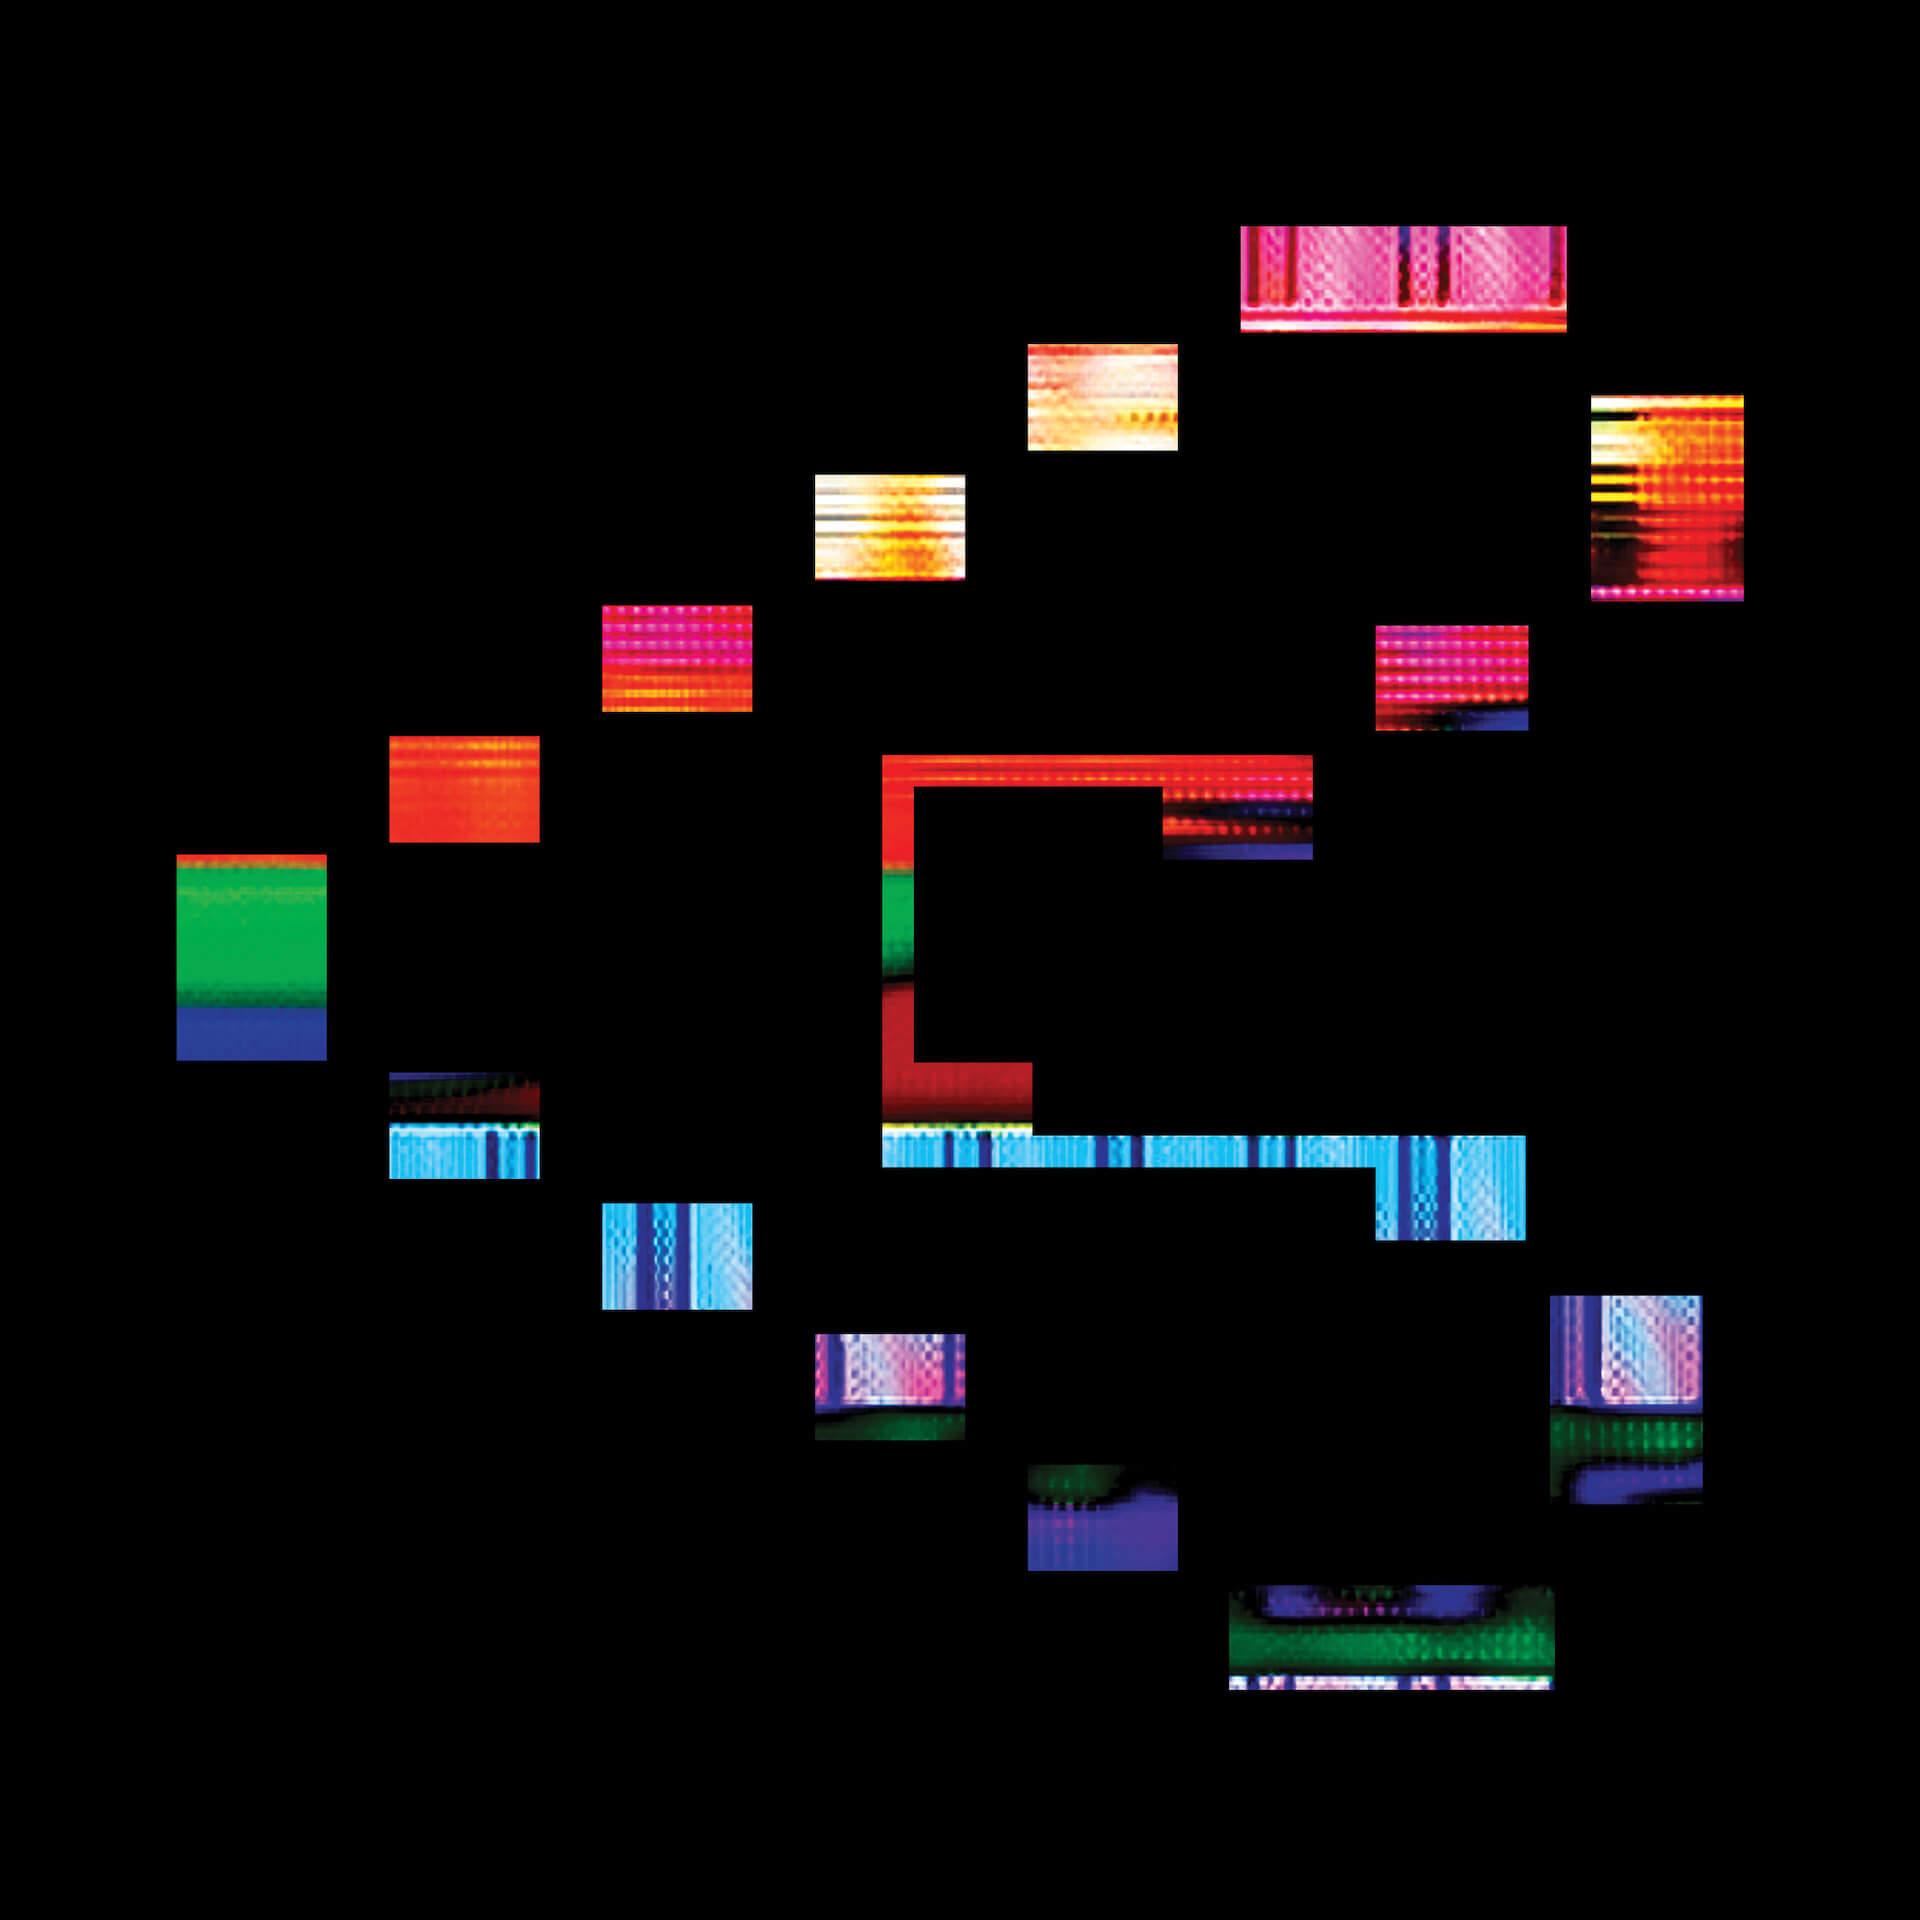 『Be Up A Hello』をリリースするスクエアプッシャー来日公演のチケット主催者先行が本日正午よりスタート!ポスターにボーナストラックQRコード付き music200114_squarepusherjapantour_01